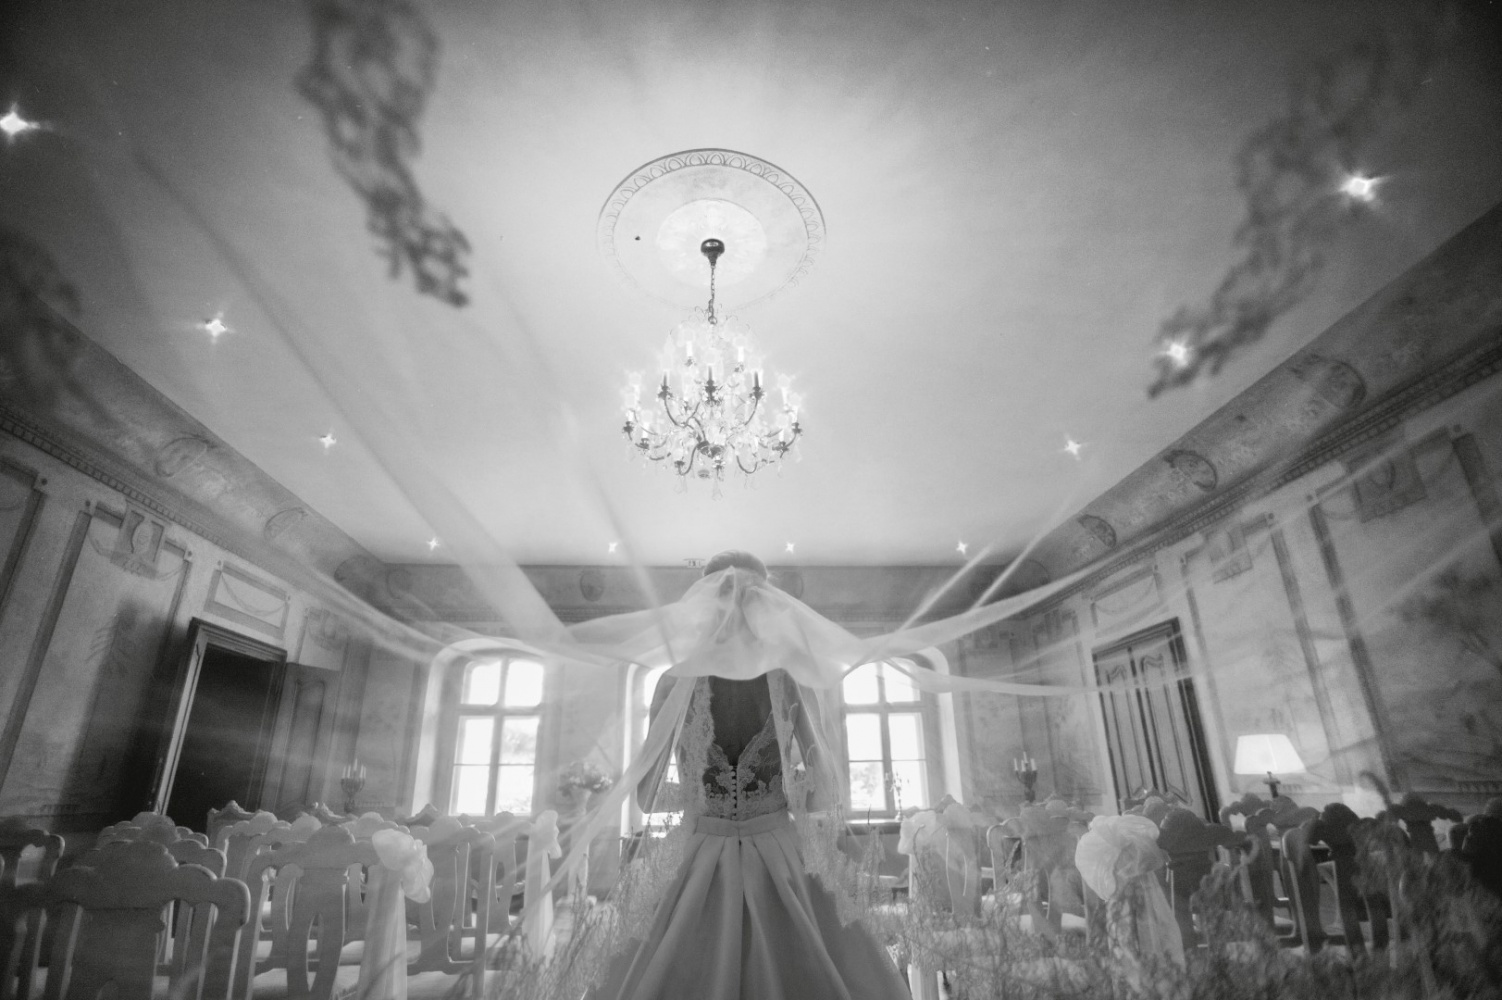 http://www.fotoz.sk/images/gallery-26/normal/svadba_hotel-chateau-bela_045.jpg